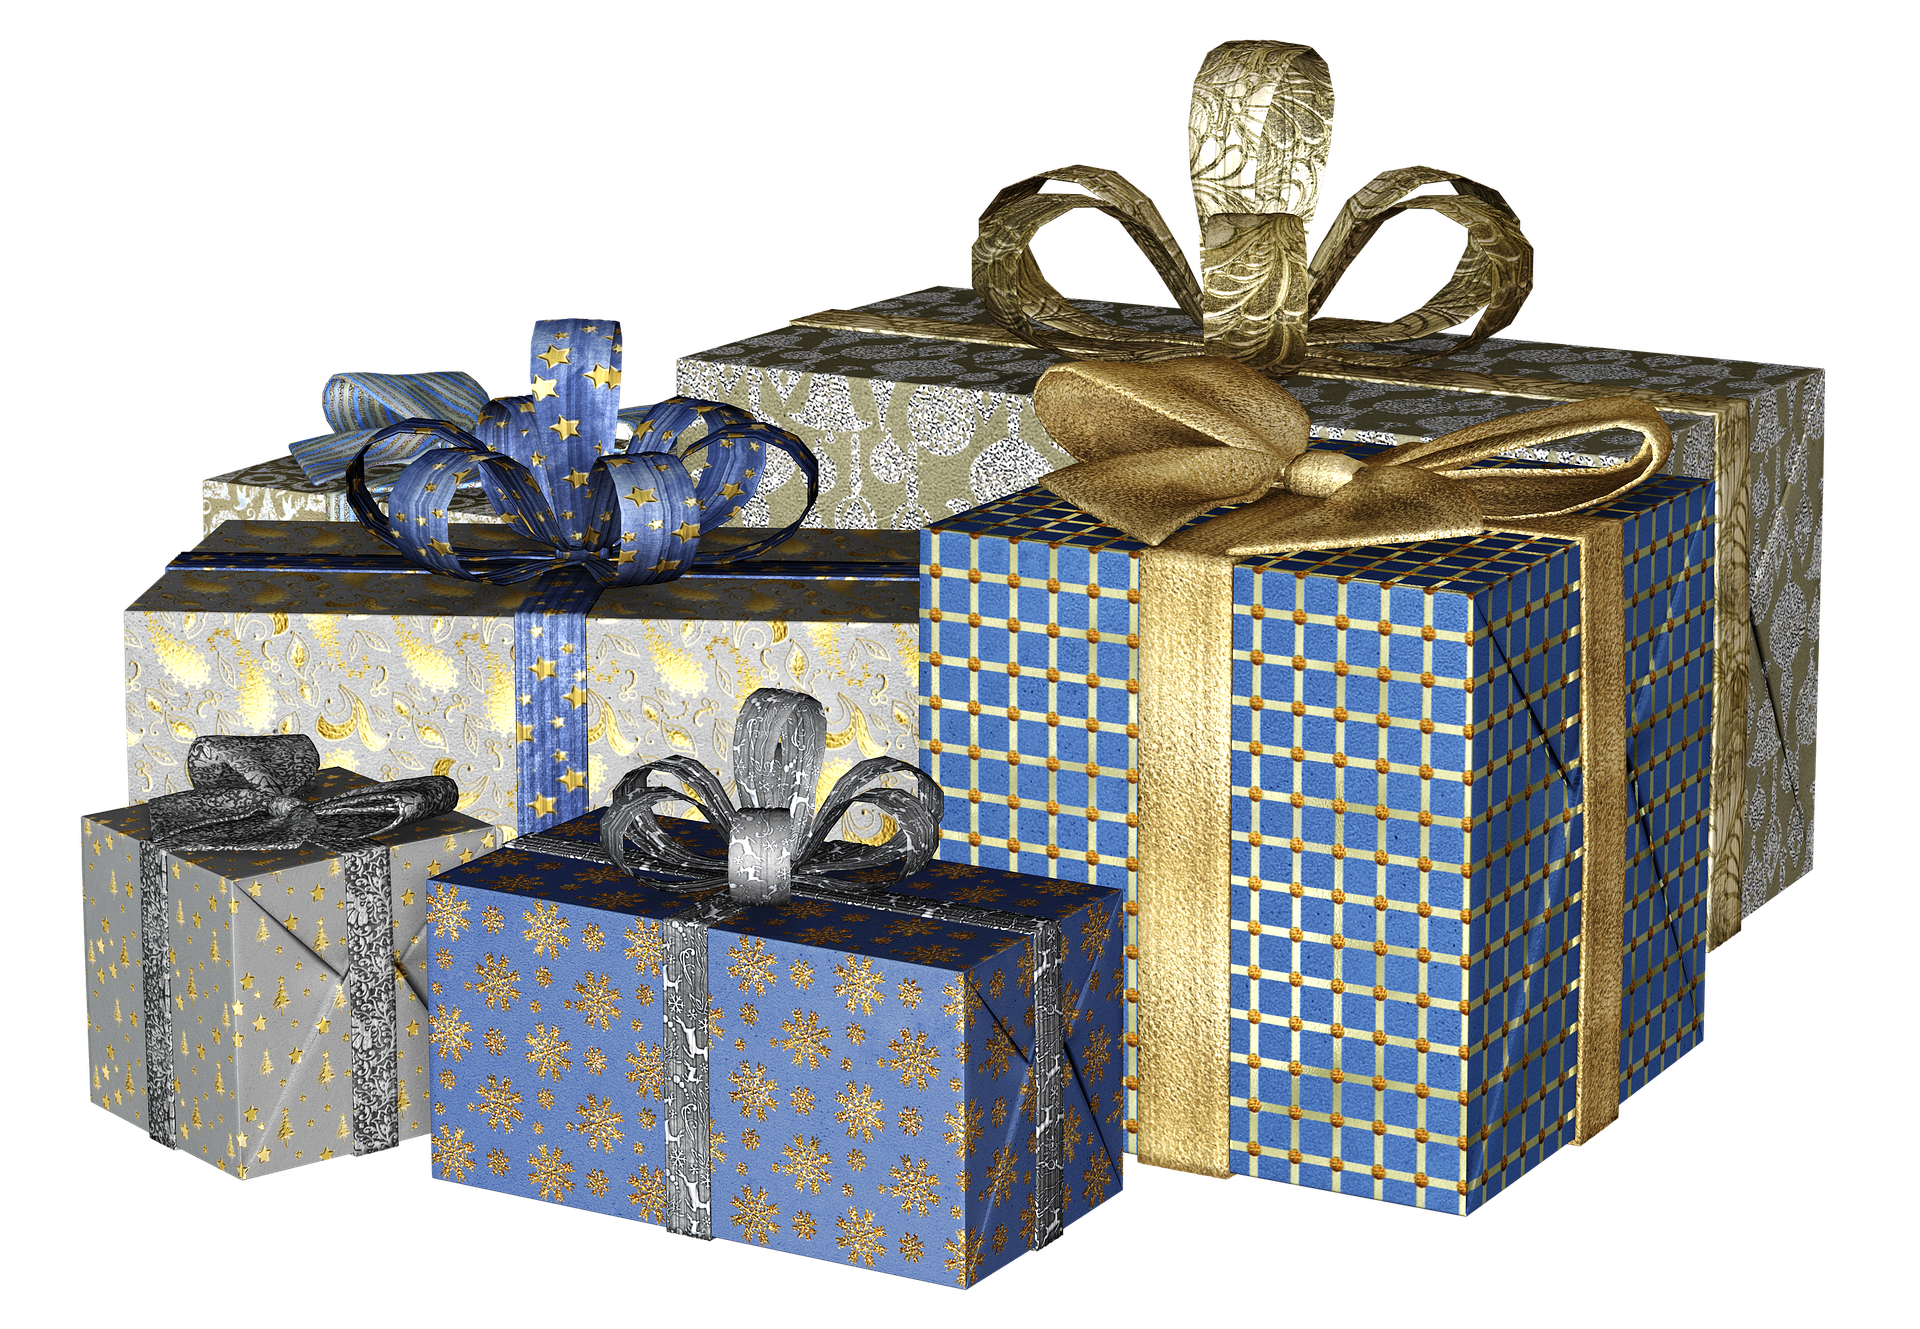 gift-3030693_1920